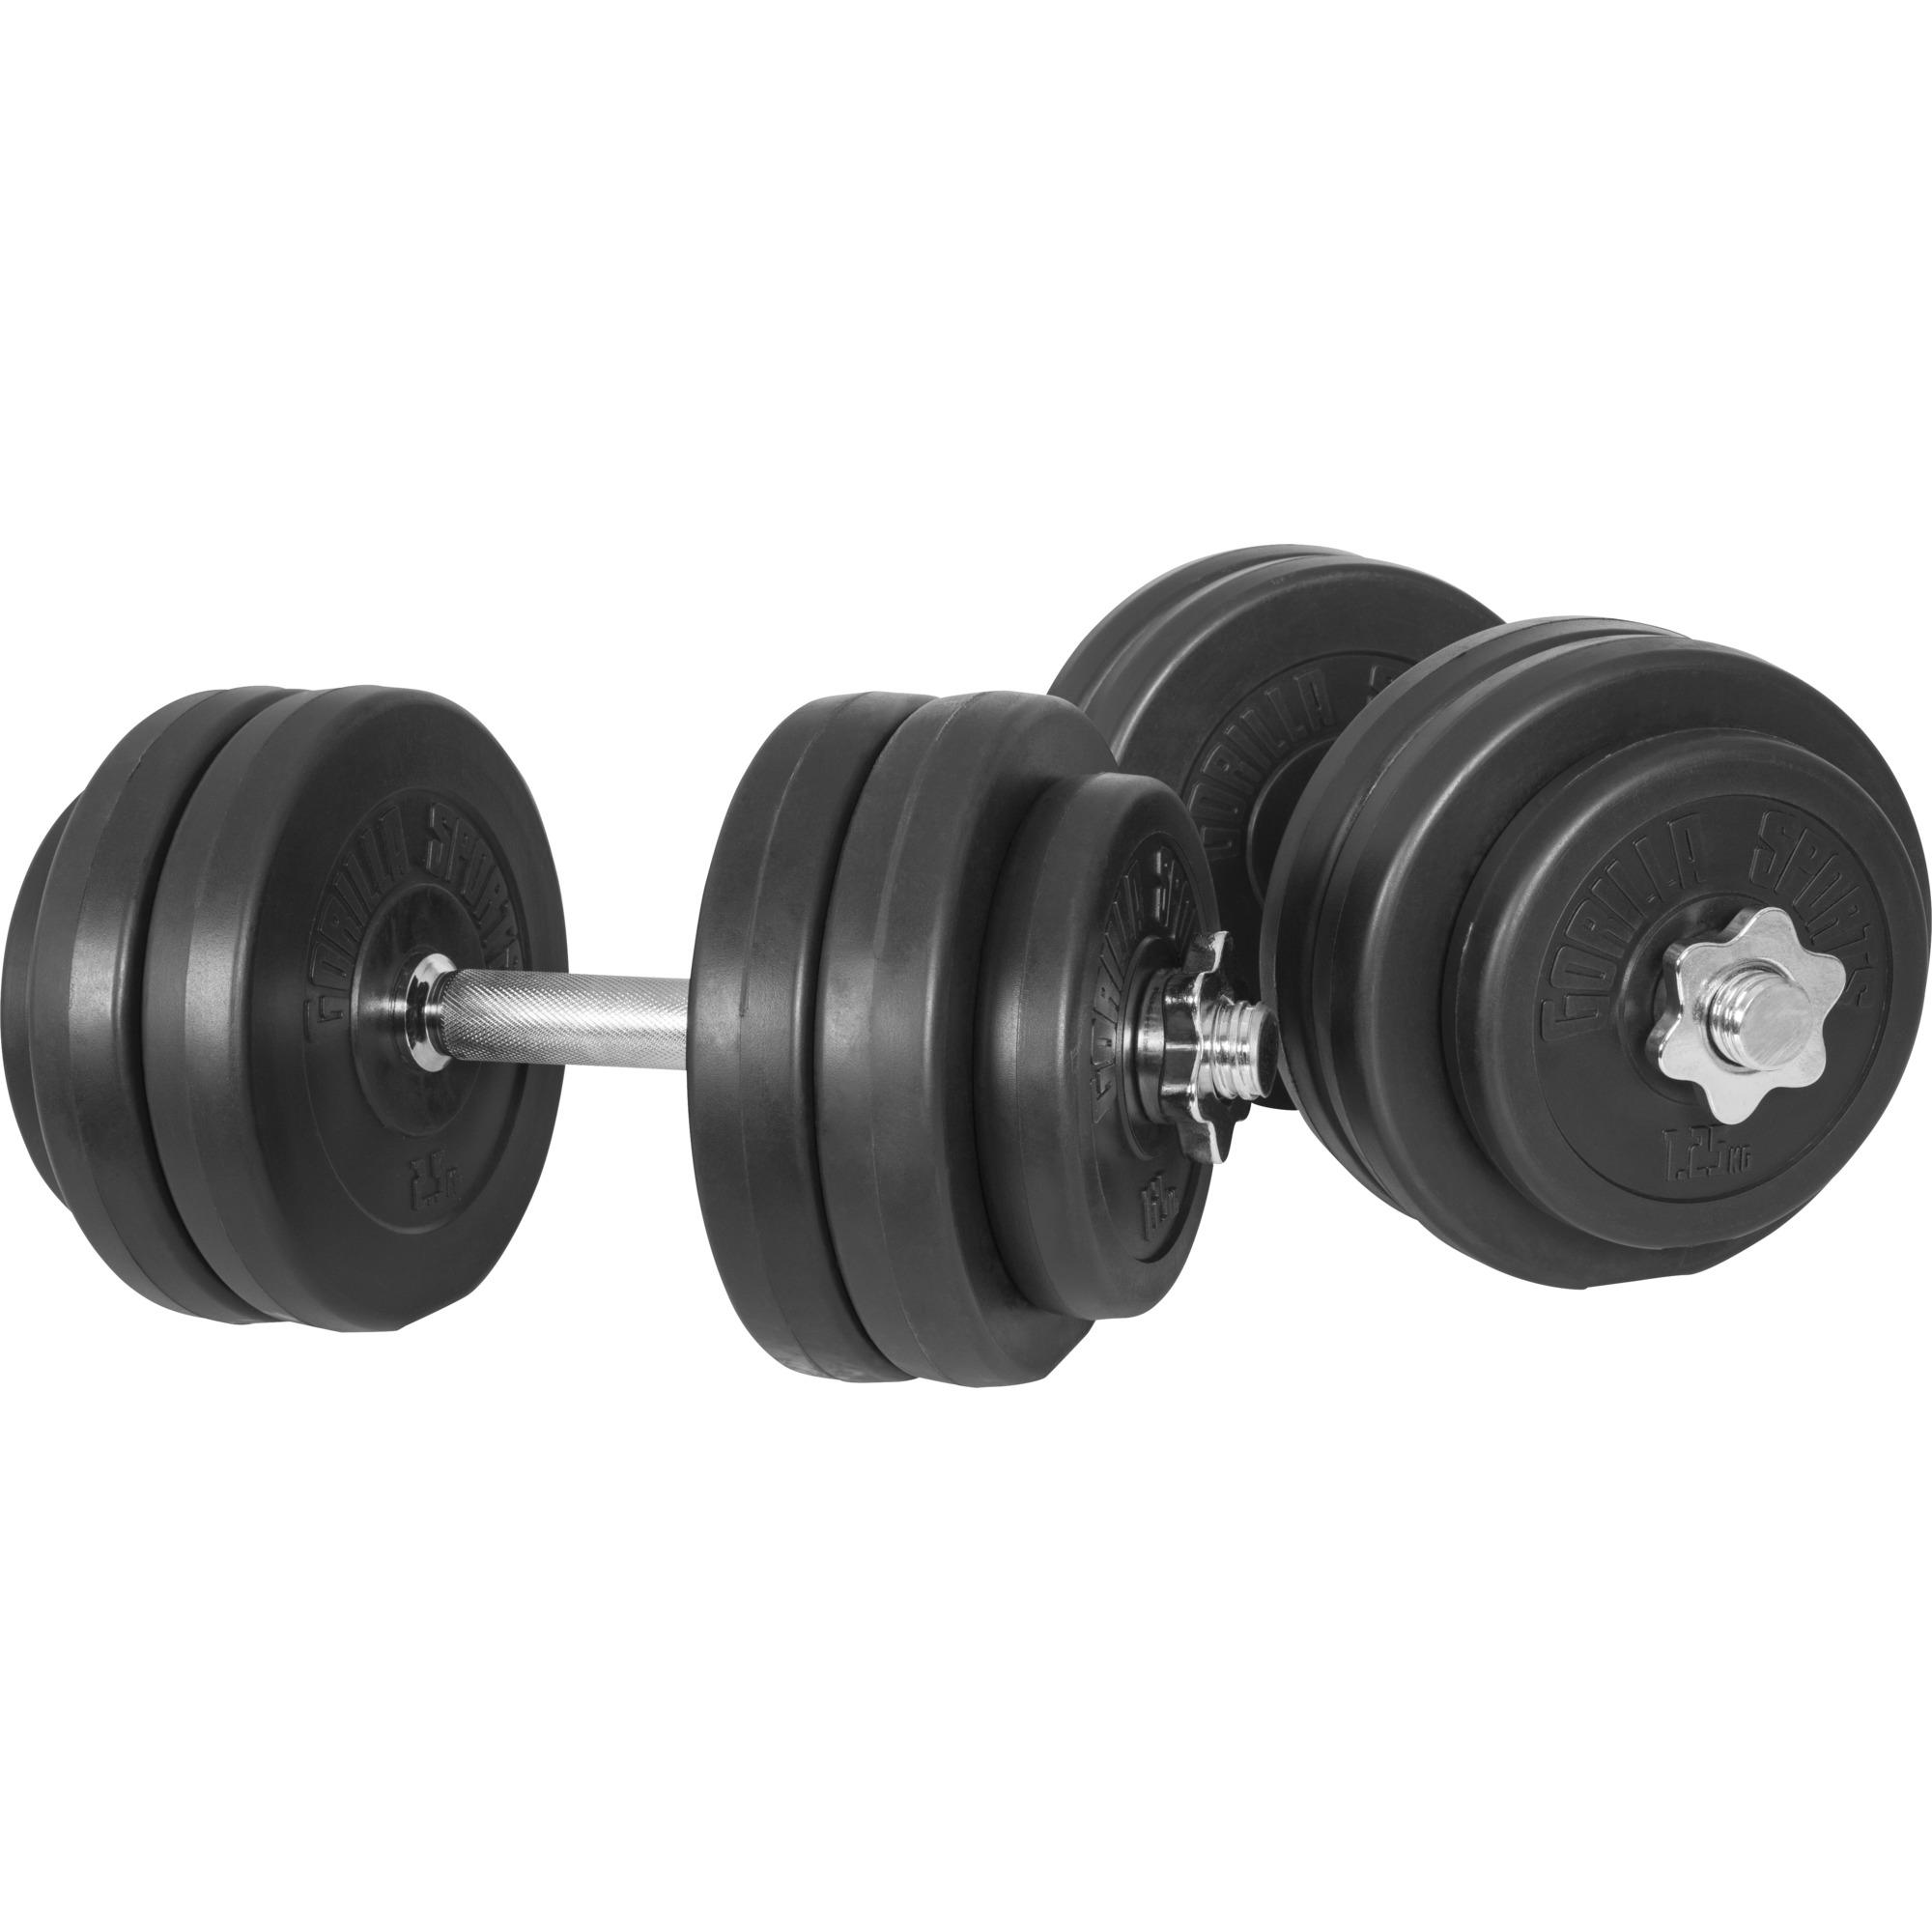 Gorilla Sports Kurzhantelset Kunststoff 30 kg 30mm McFit Kurzhantelset 30 kg